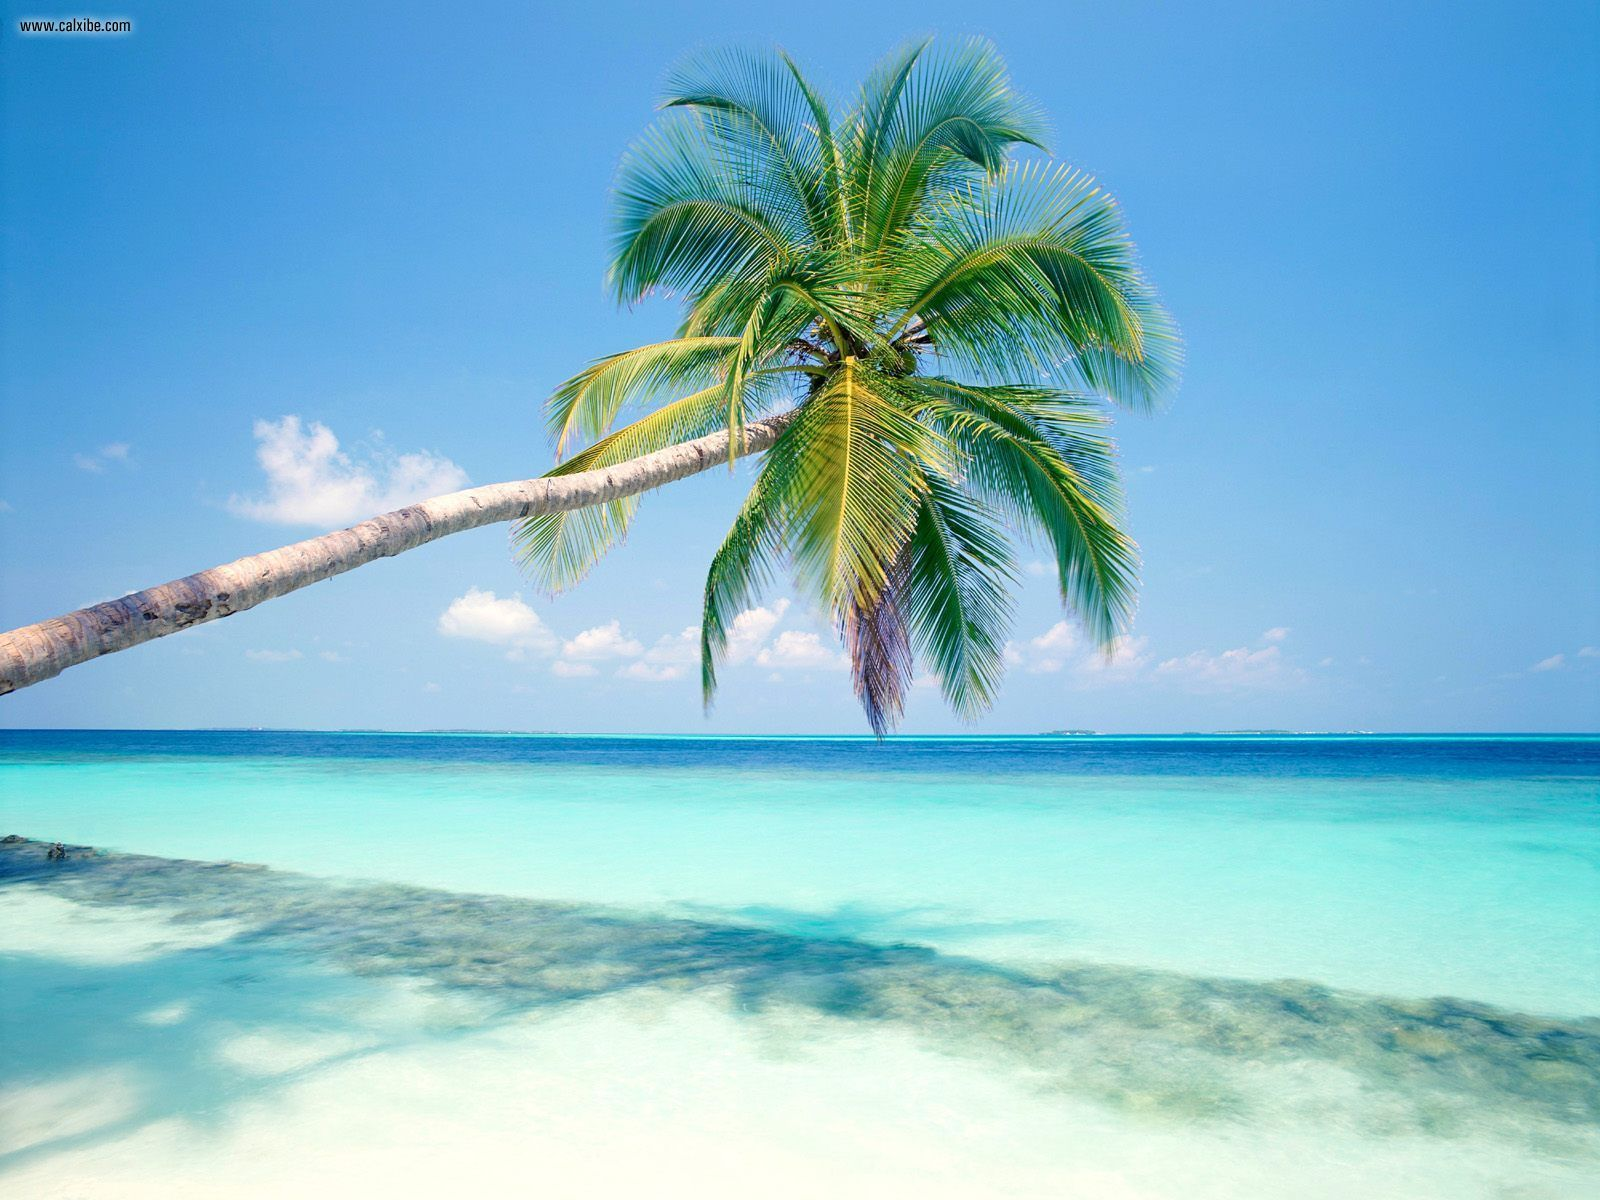 Tropical island maldives